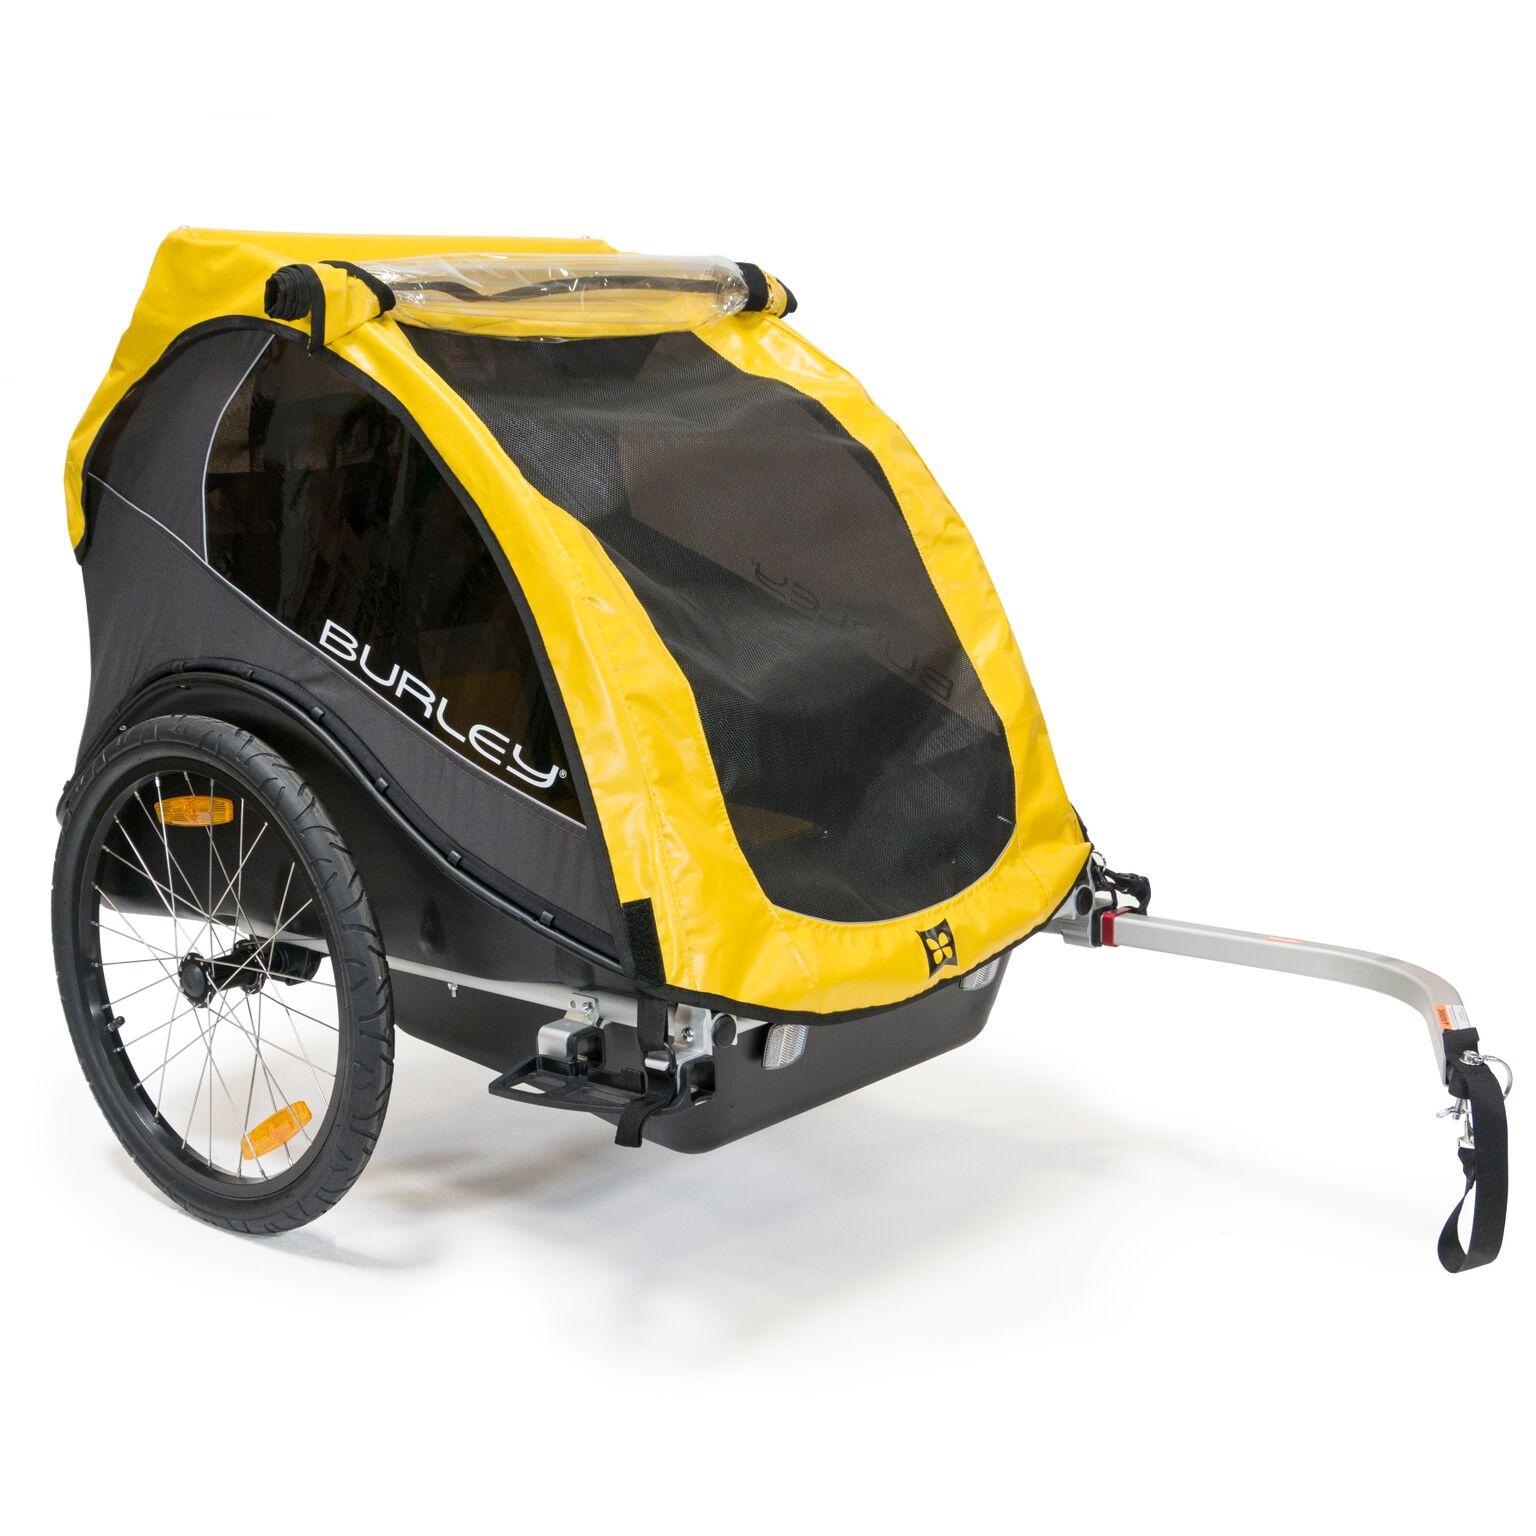 Burley Rental Cub Child Bicycle Trailer Yellow